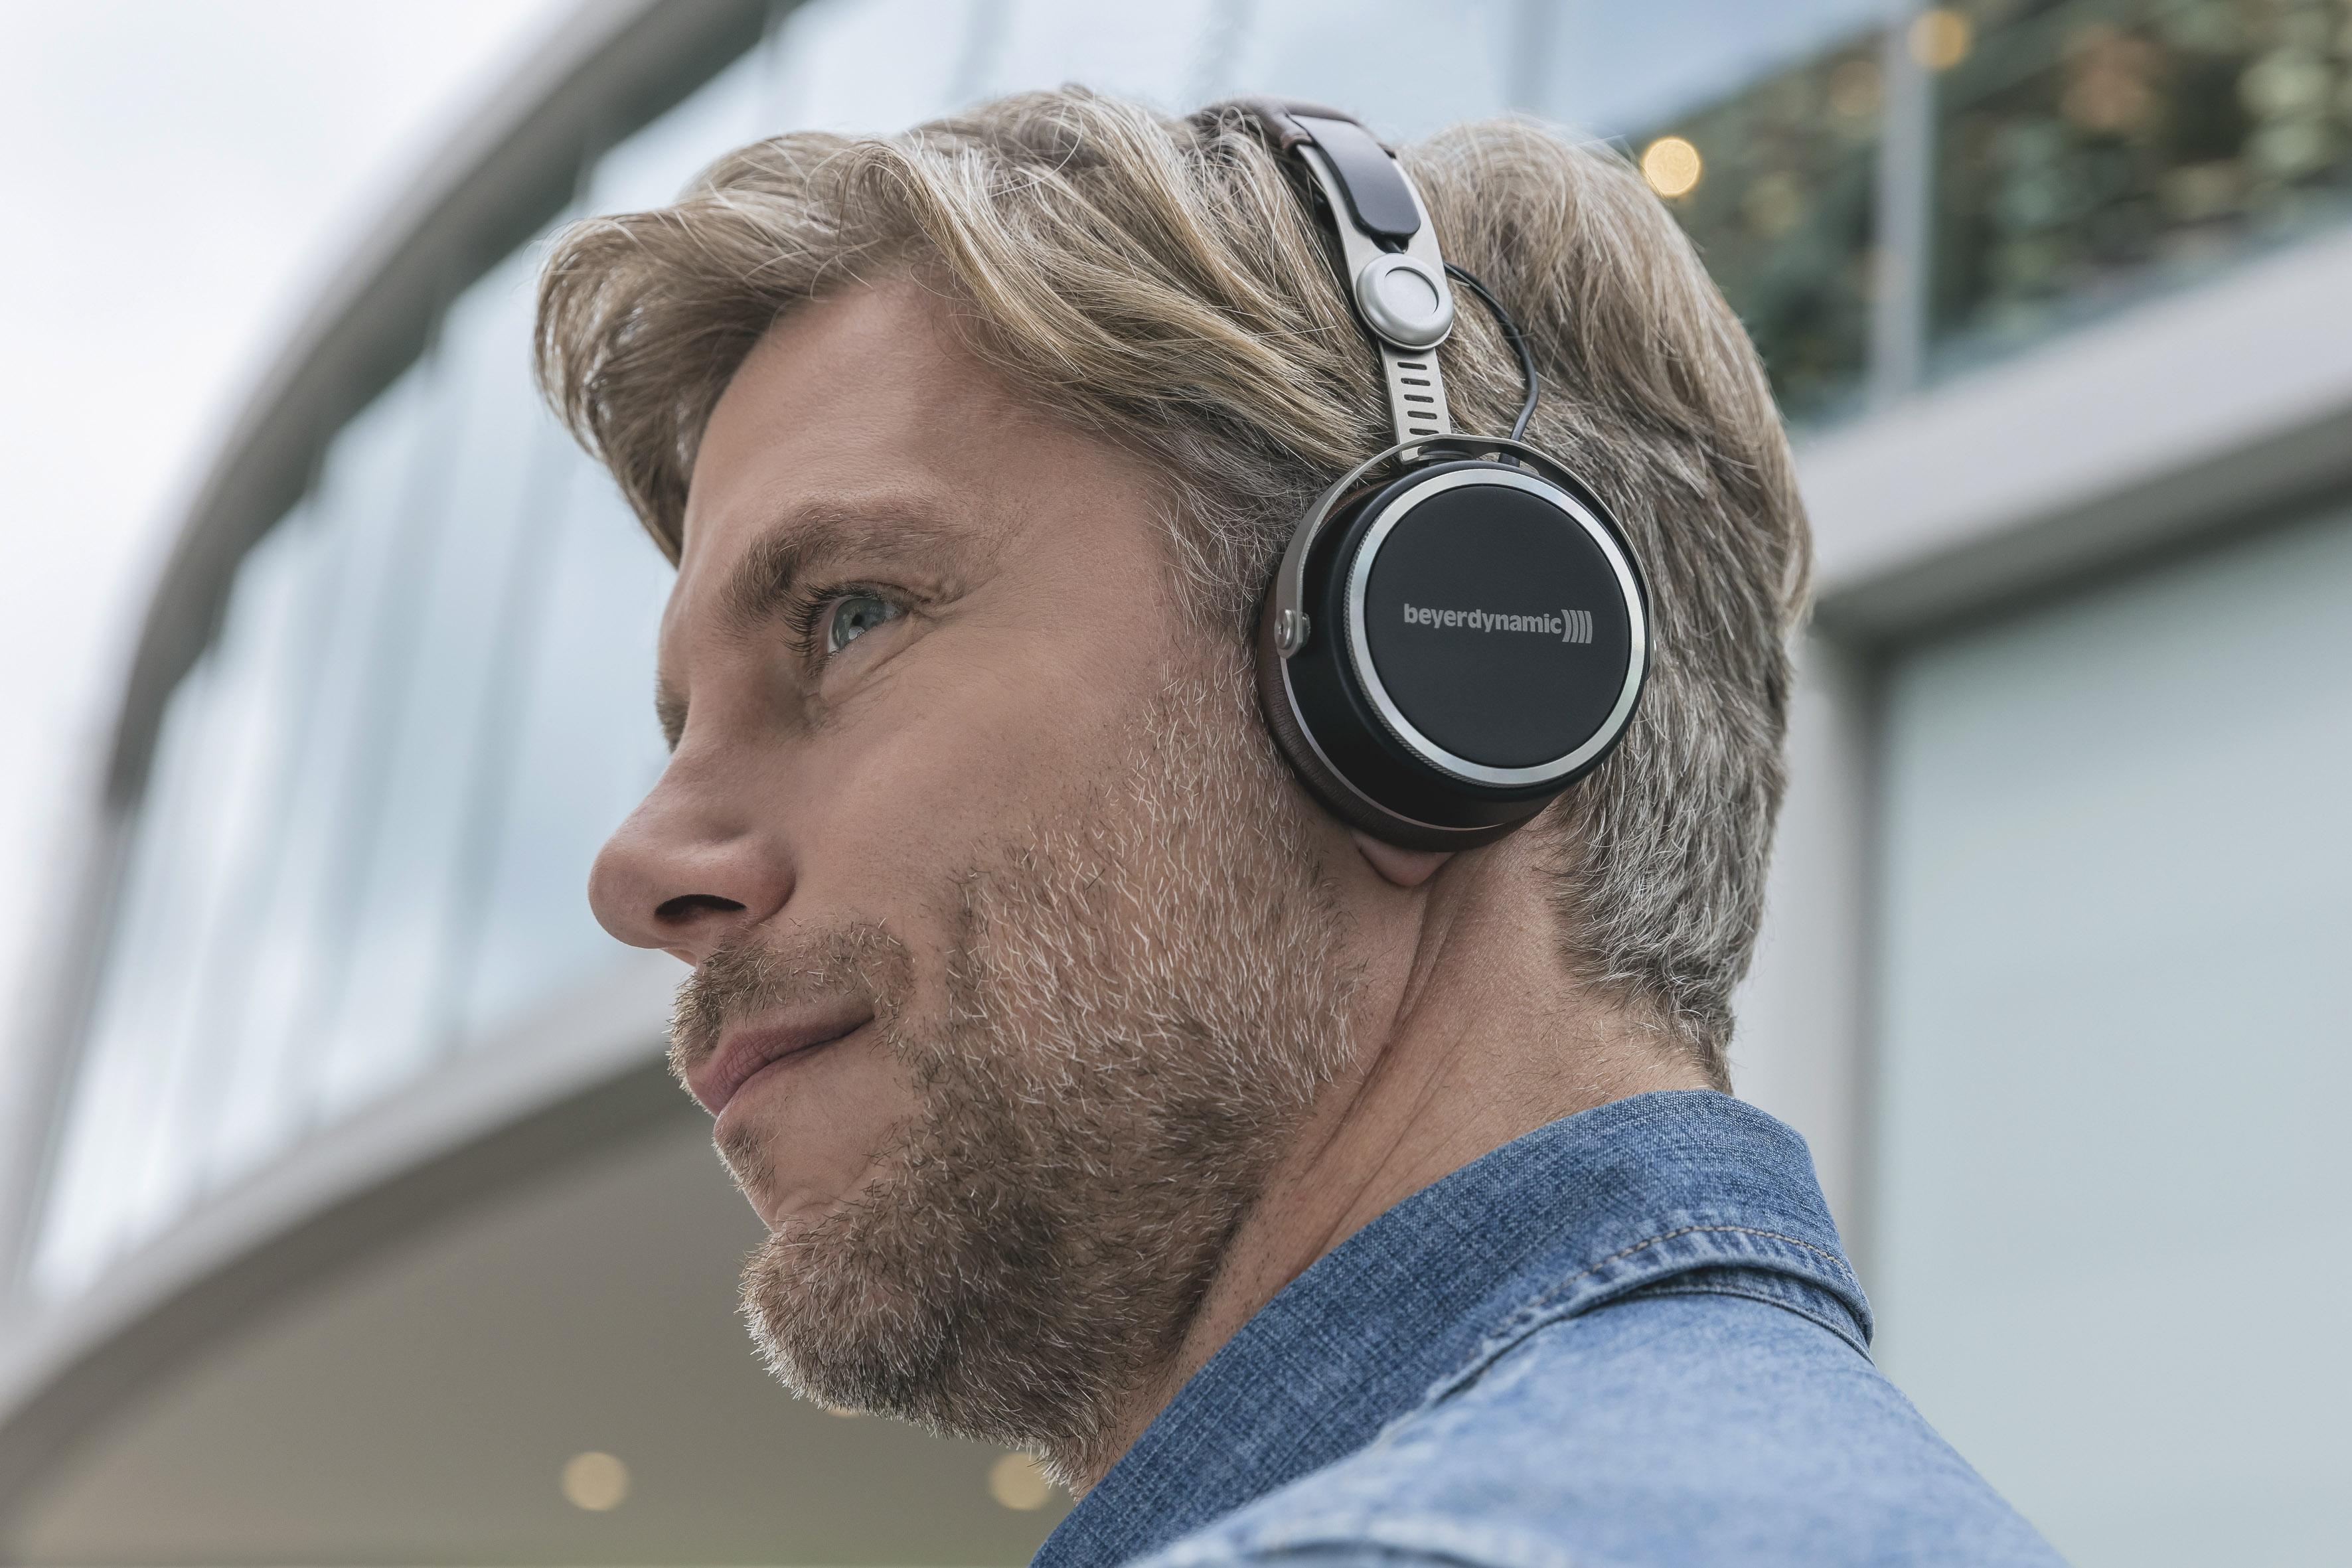 624dd22798e Aventho wireless enters a new headphones era